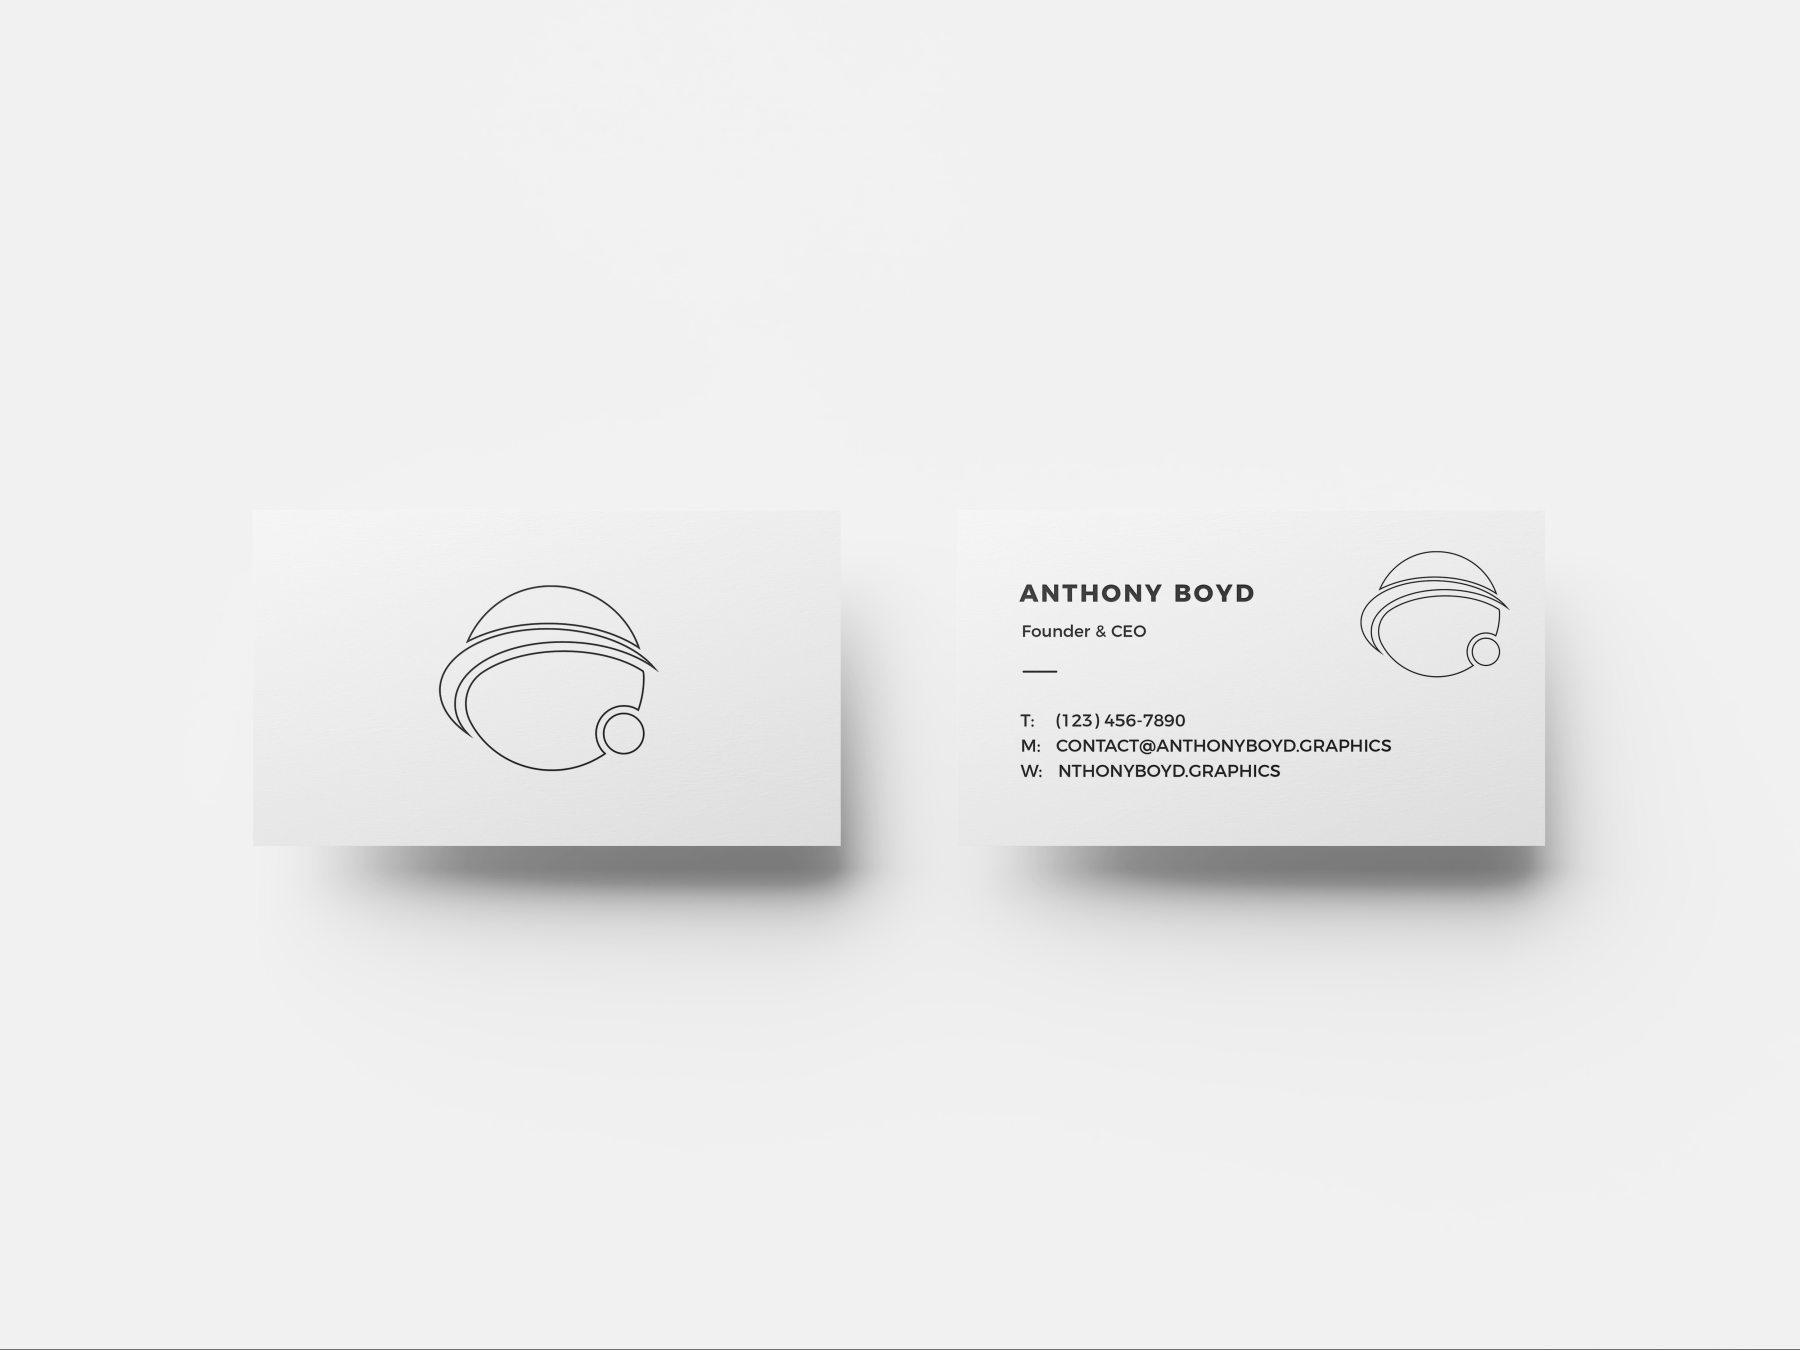 1569726397 31b84fc42bca993 - 简约质感商务风名片logo样机